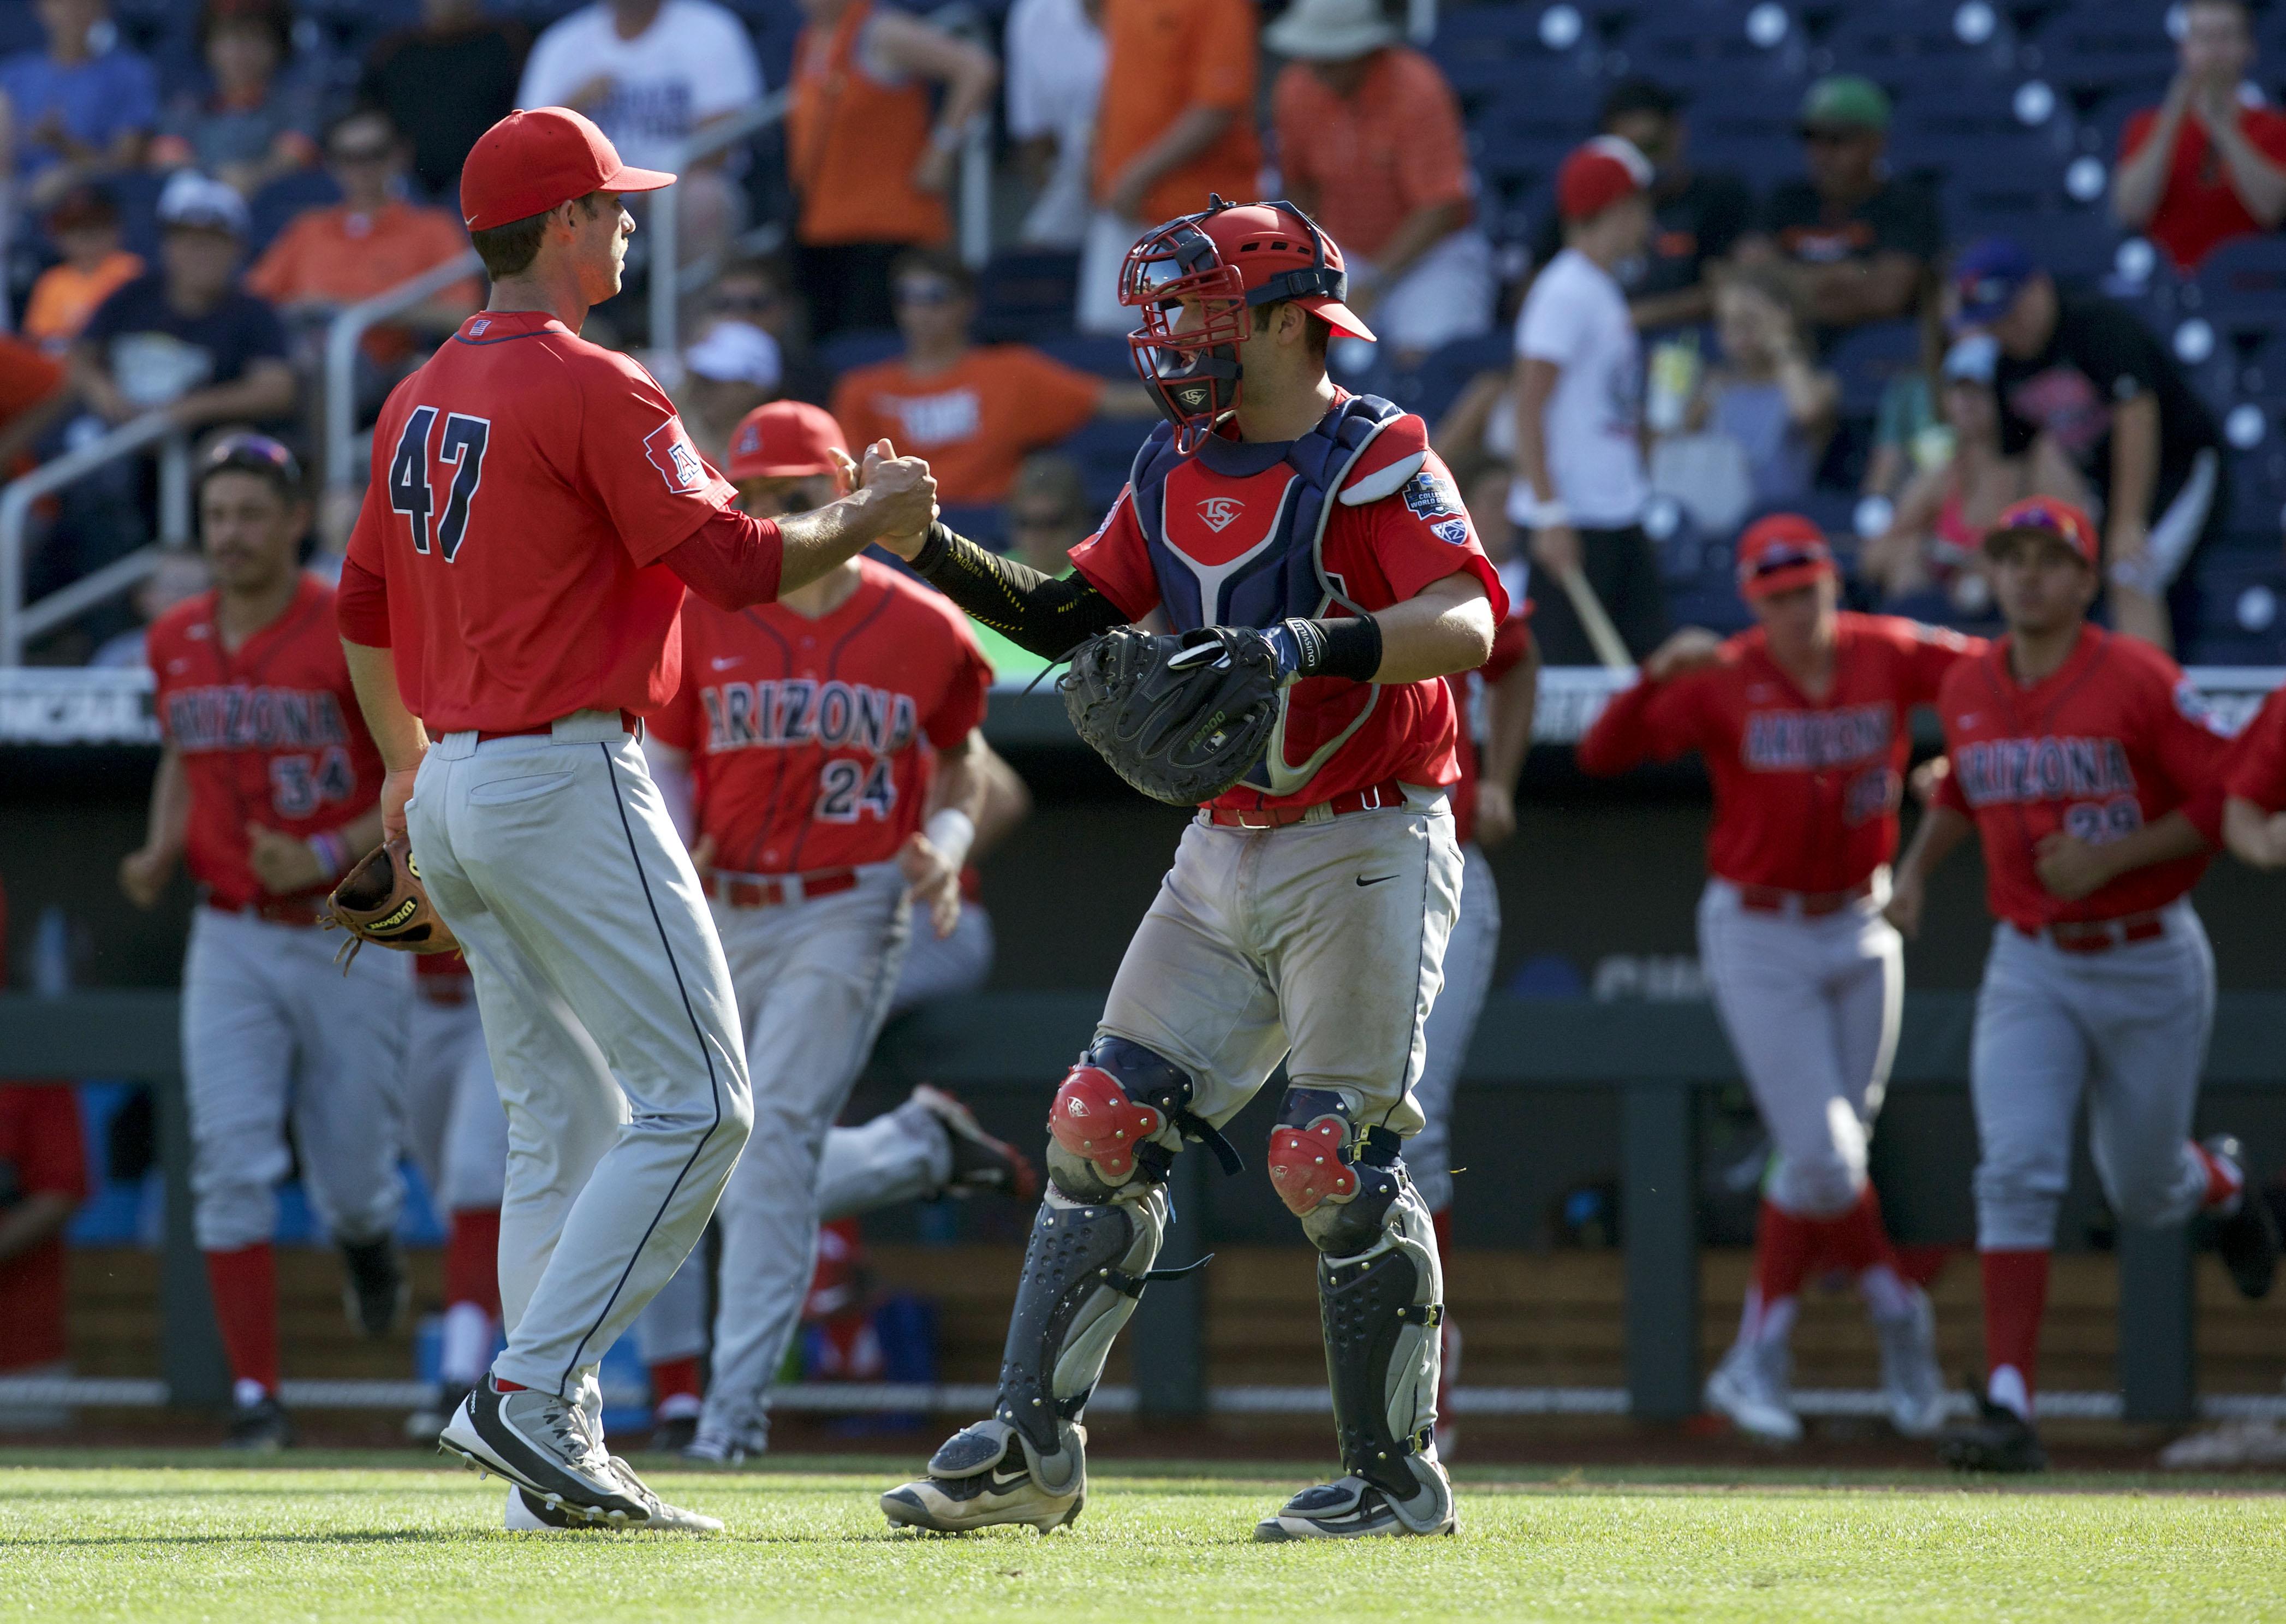 9354605-ncaa-baseball-college-world-series-arizona-vs-oklahoma-state